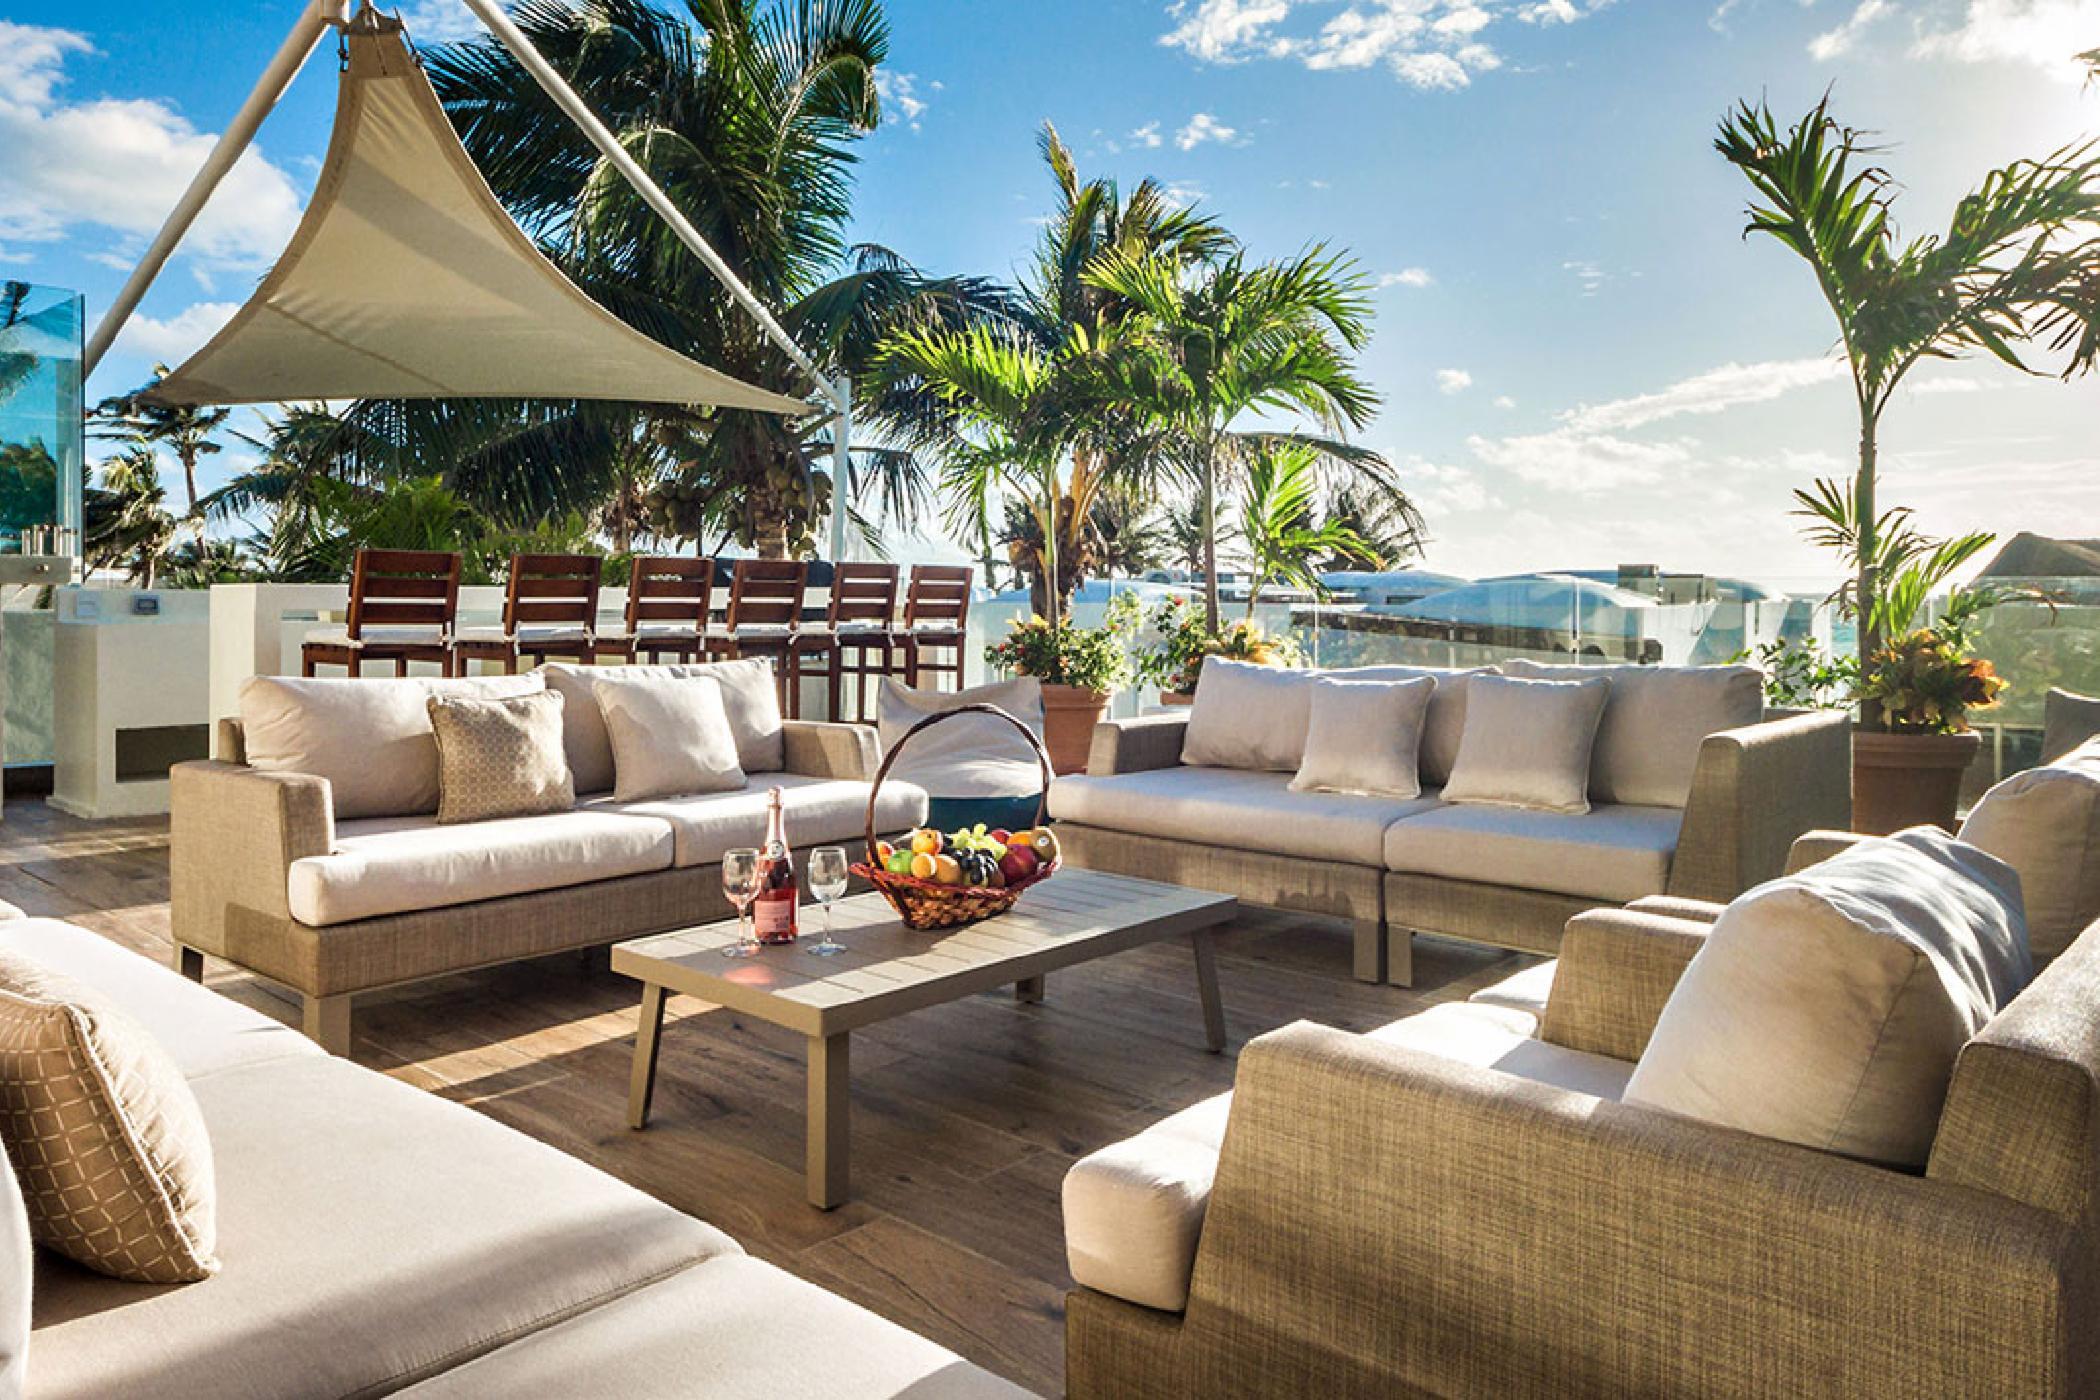 Maya_Luxe_Riviera_Maya_Luxury_Villas_Experiences_Vista_Hermosa_6.jpg